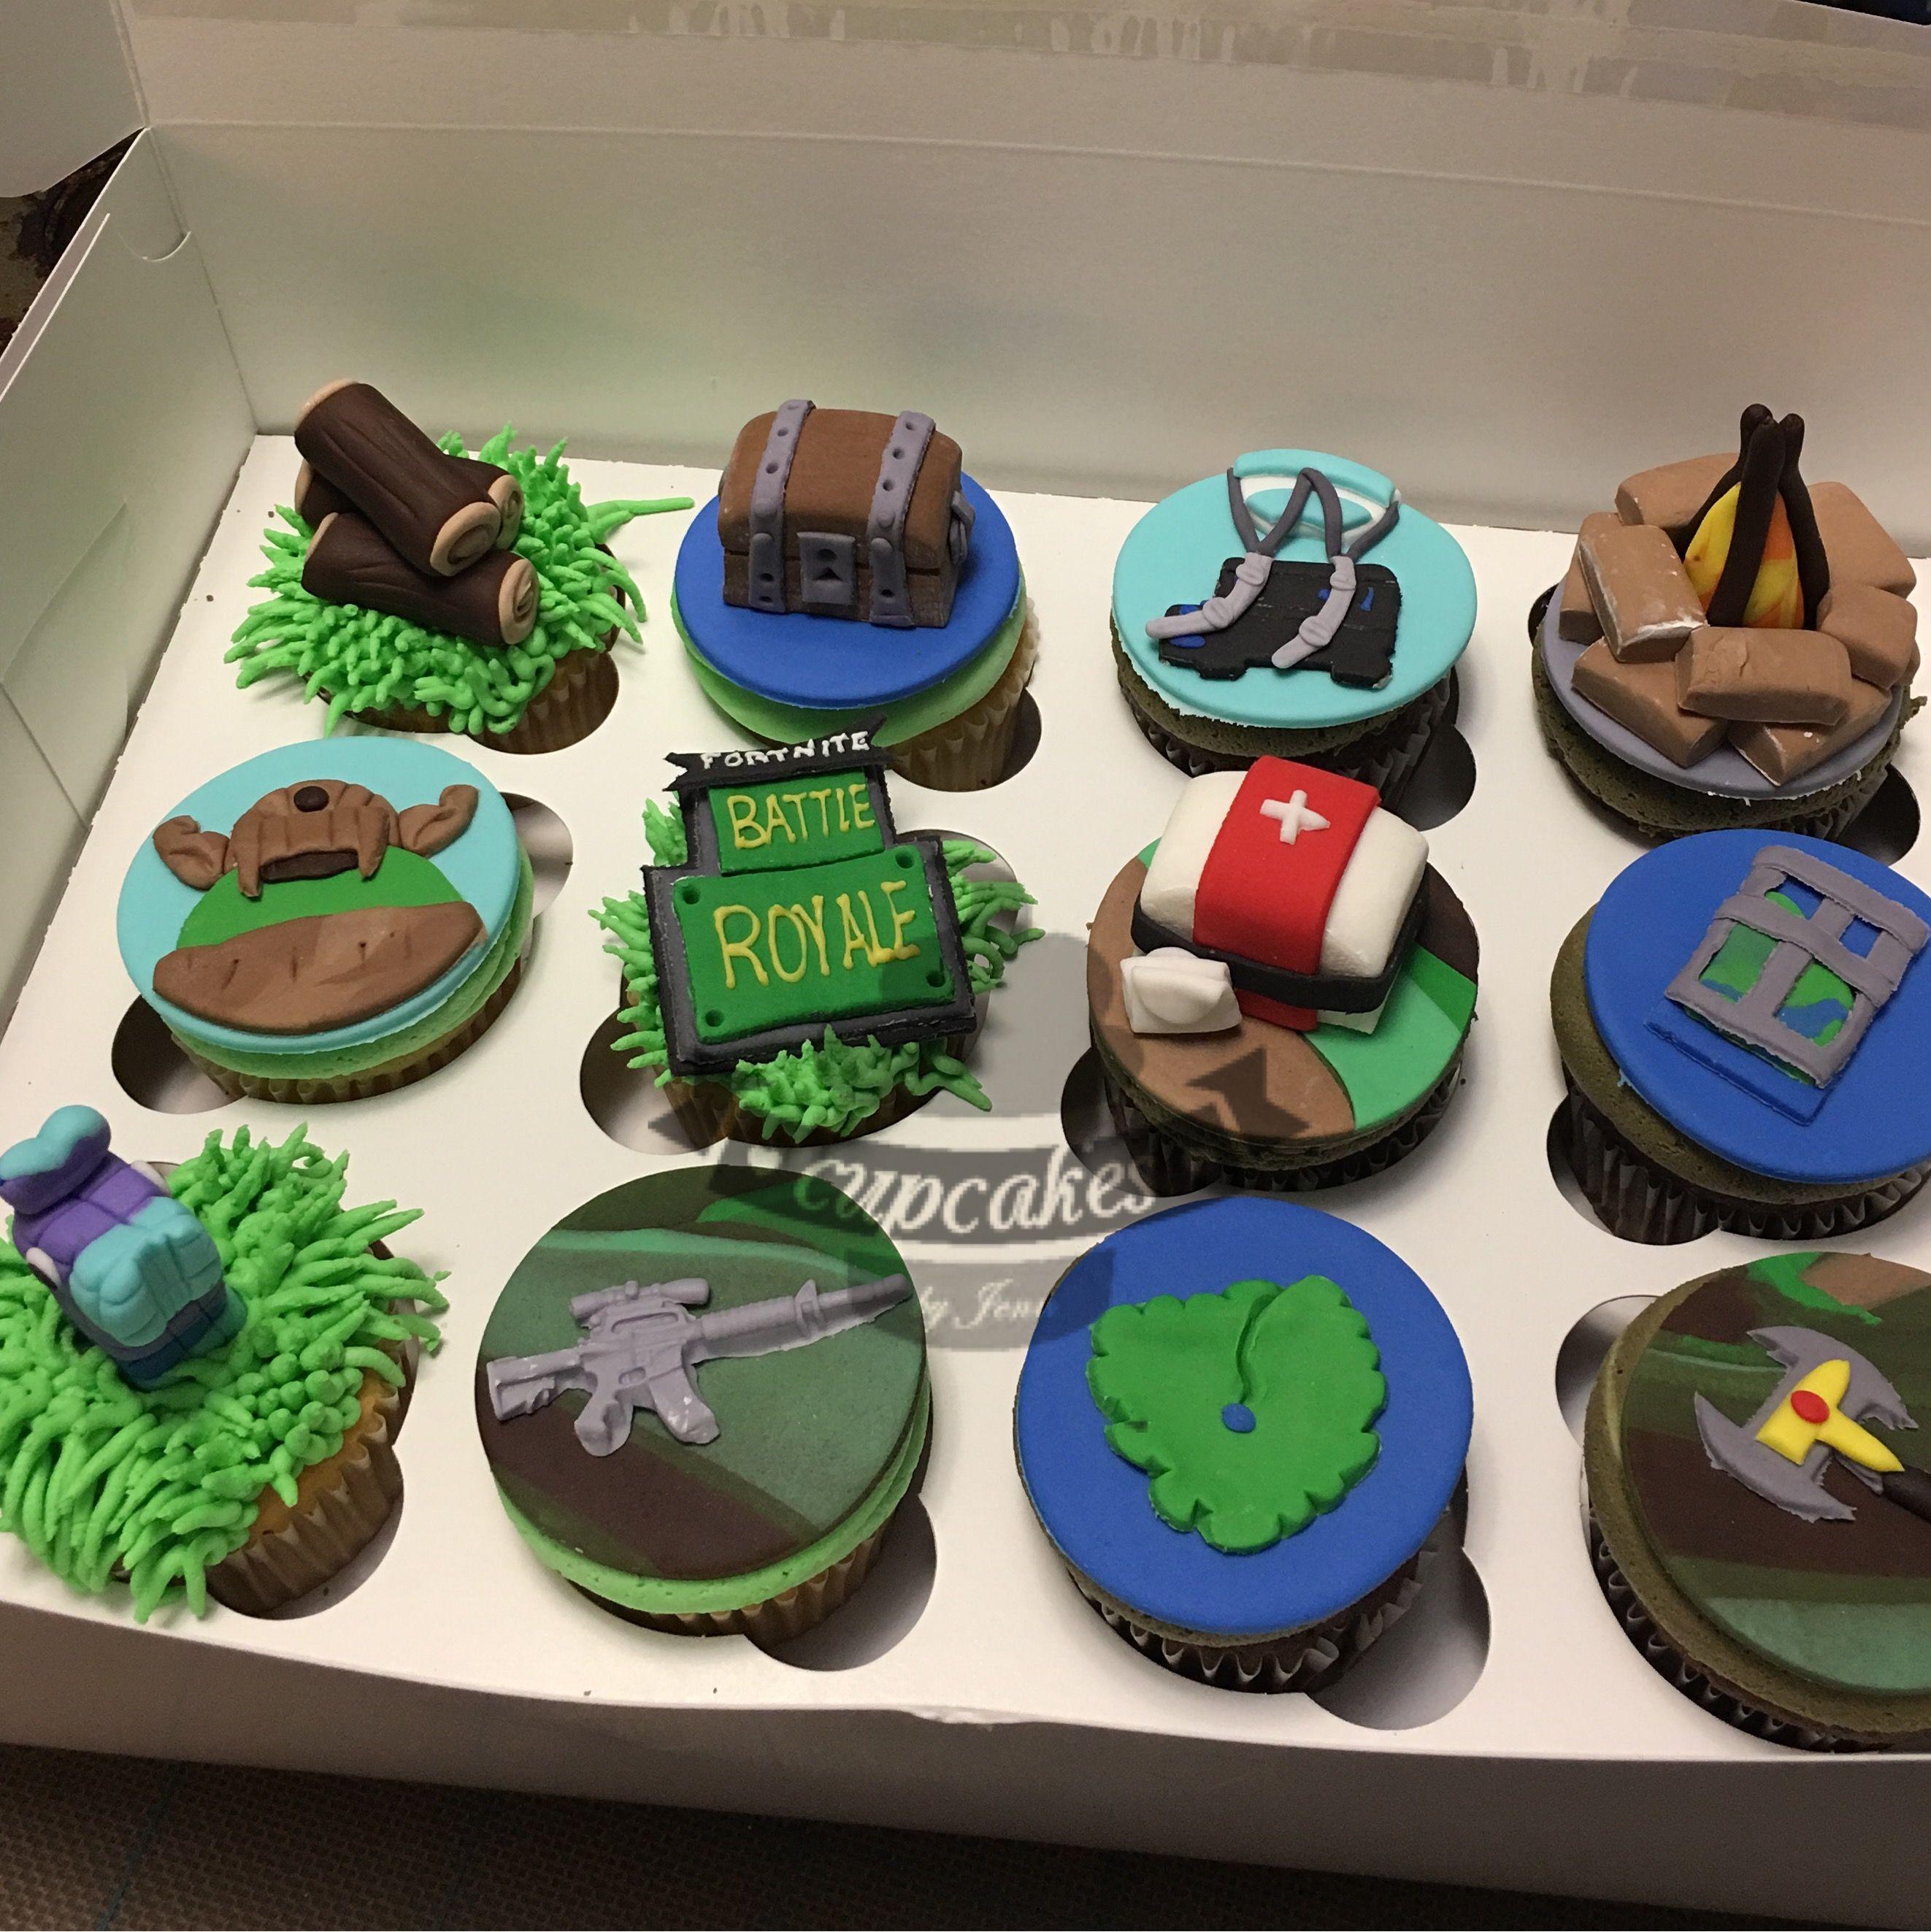 fortnite cupcakes - fortnite fondant cake decorations